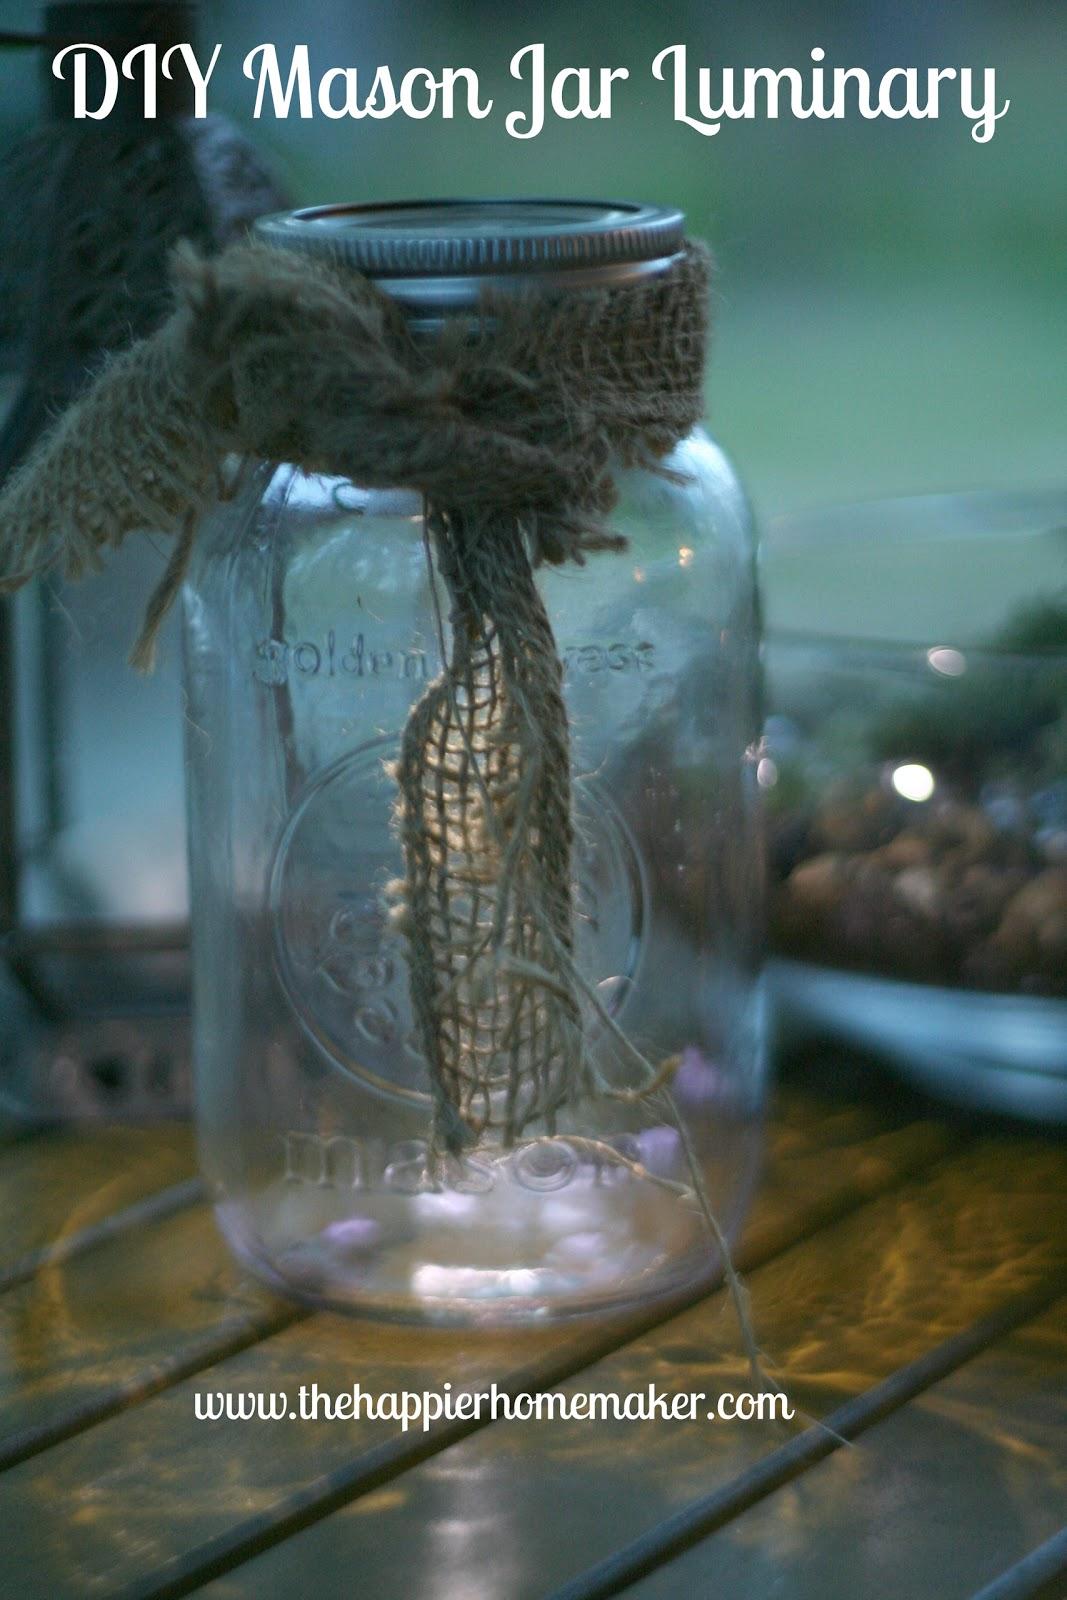 DIY Mason Jar Luminary | The Happier Homemaker